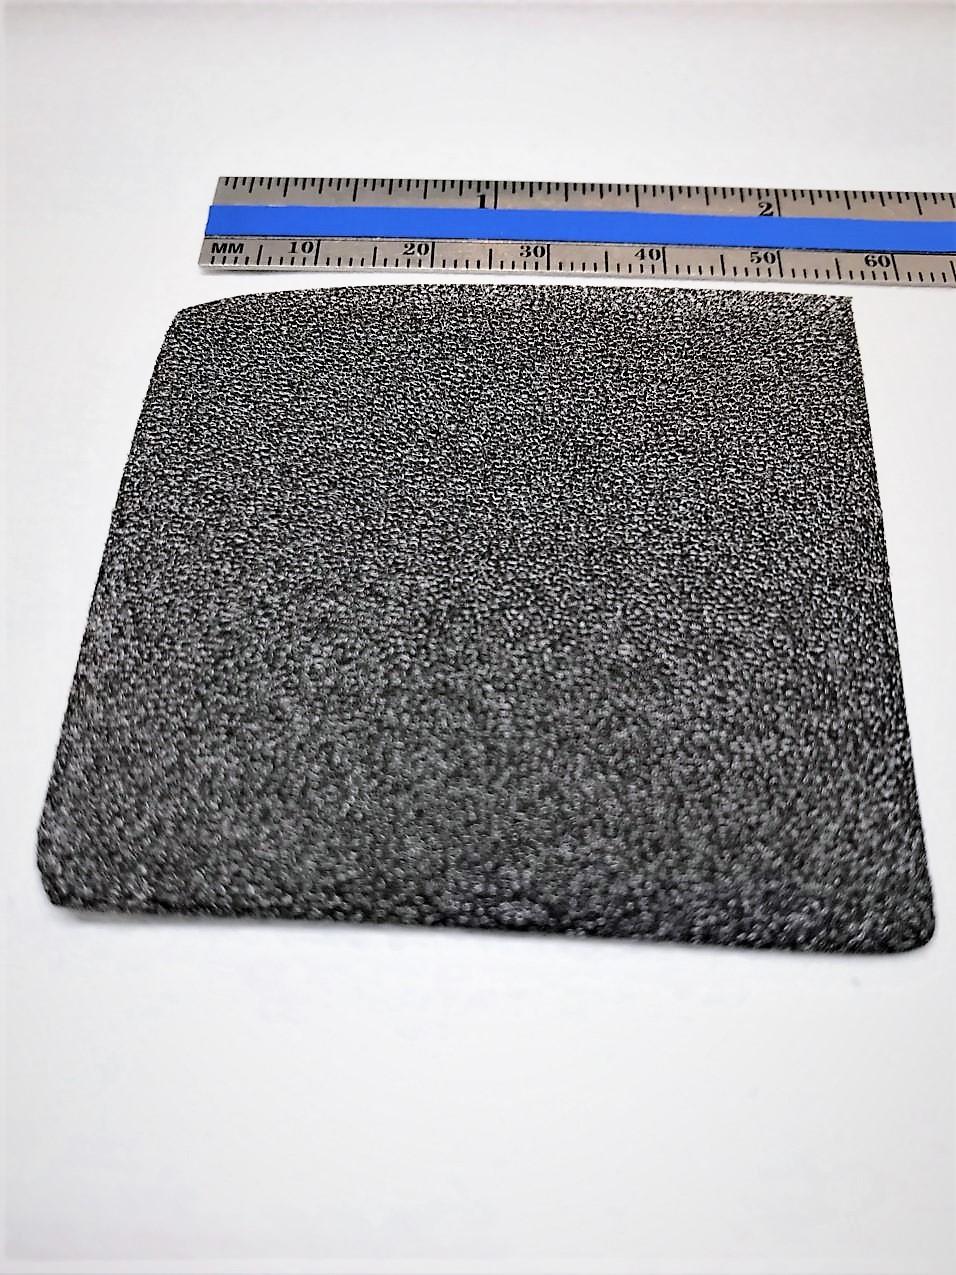 graphene-nickel-foam-3.jpg